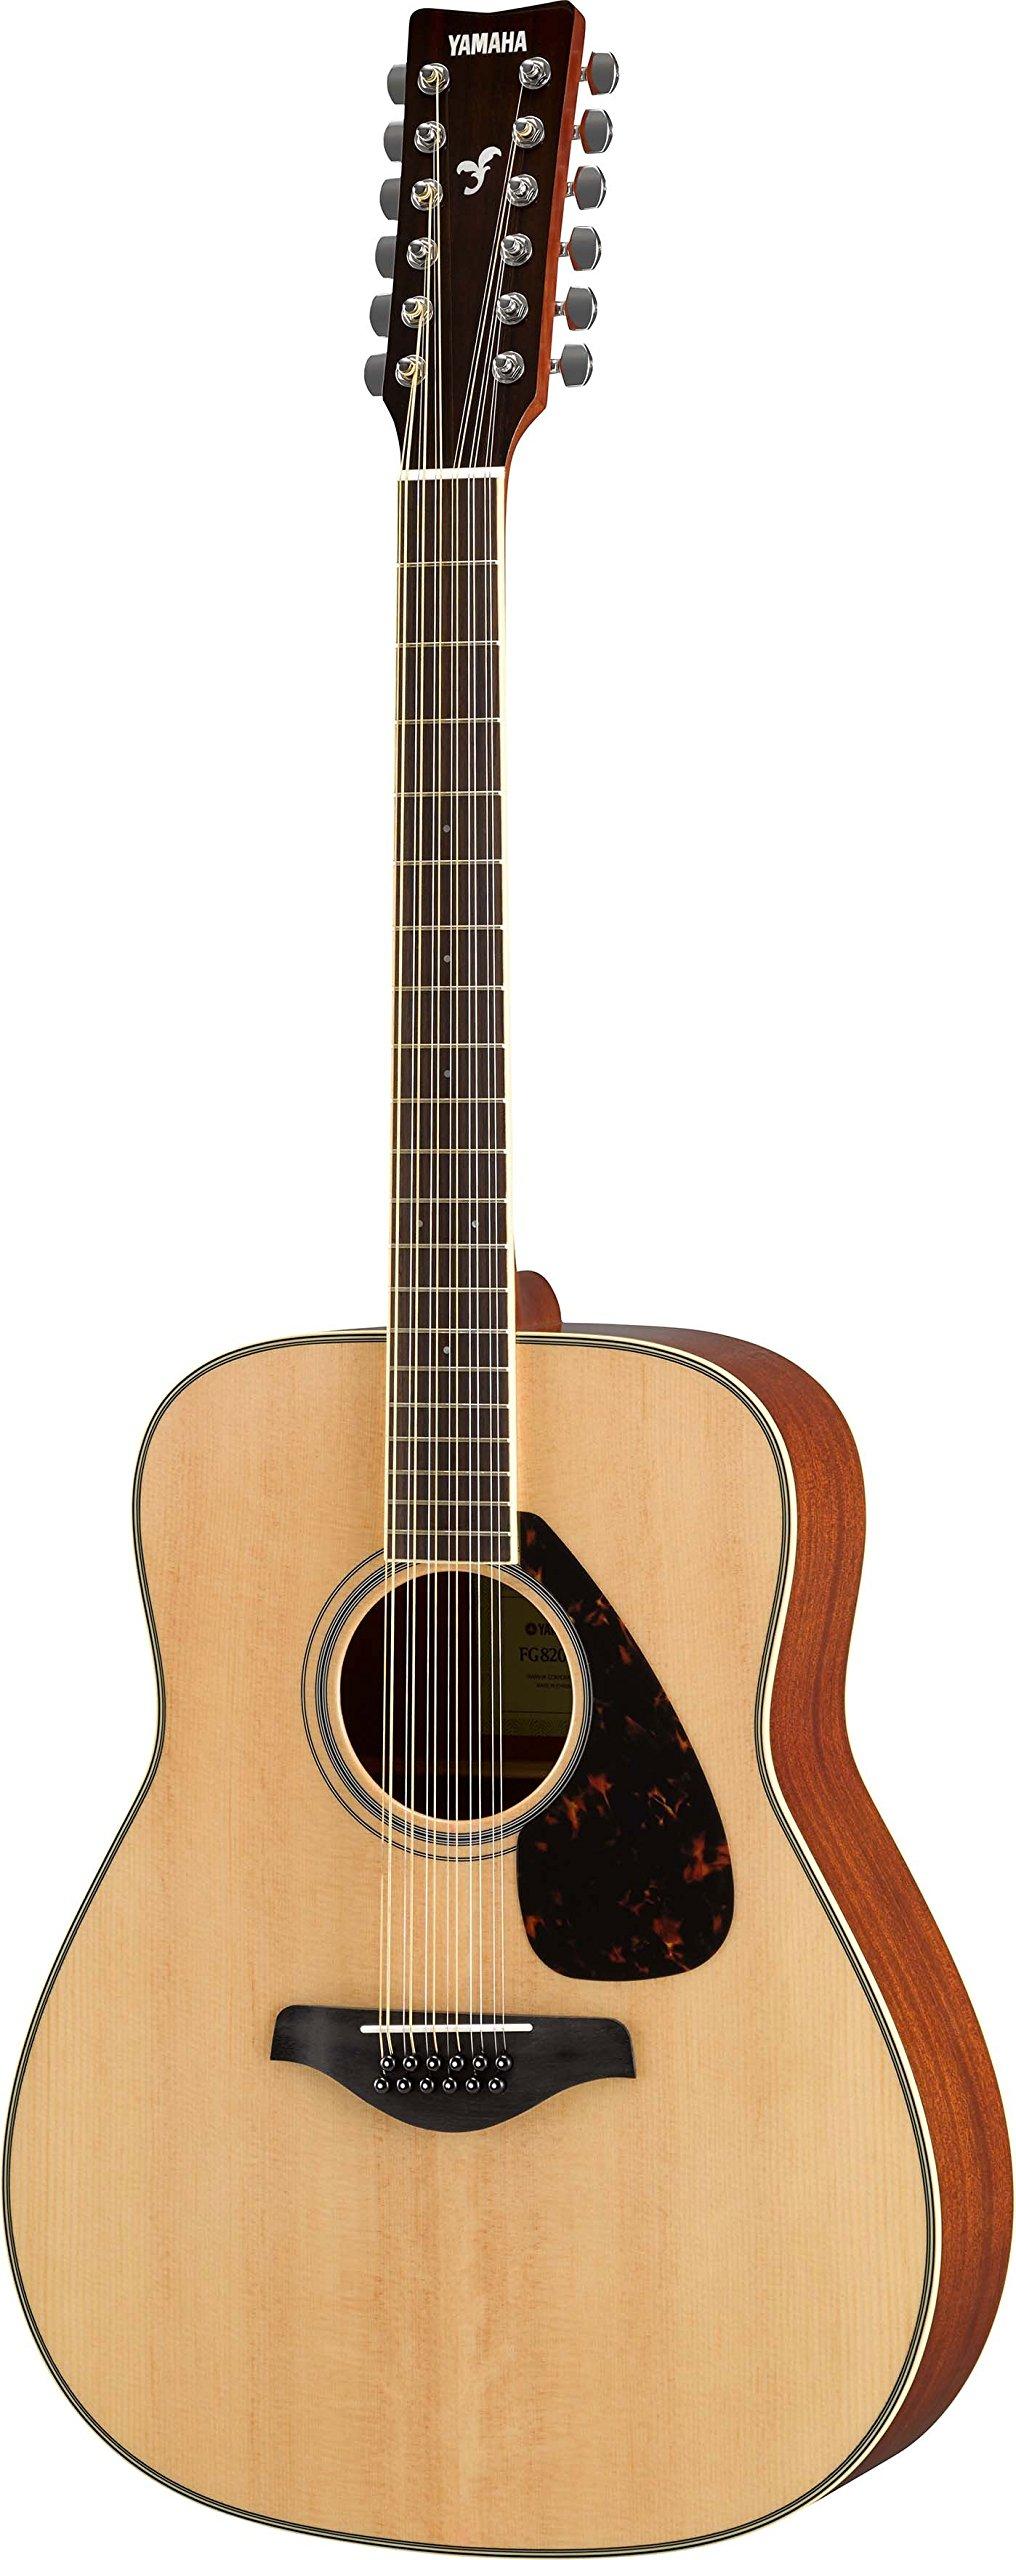 Yamaha FG820 12-String Solid Top Acoustic Guitar by YAMAHA